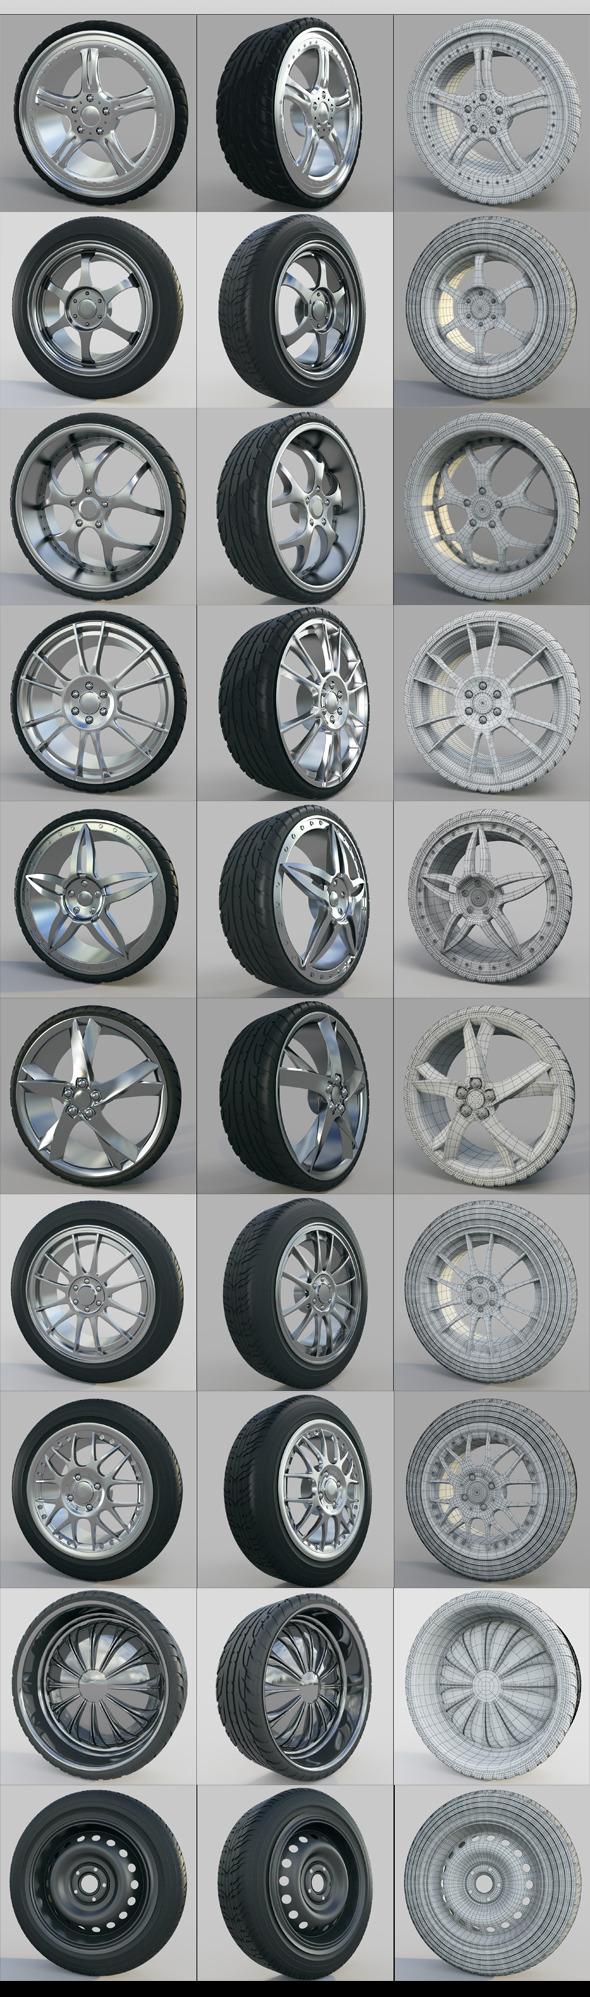 3DOcean High detailed car wheels 3D models 10 wheels 11033673